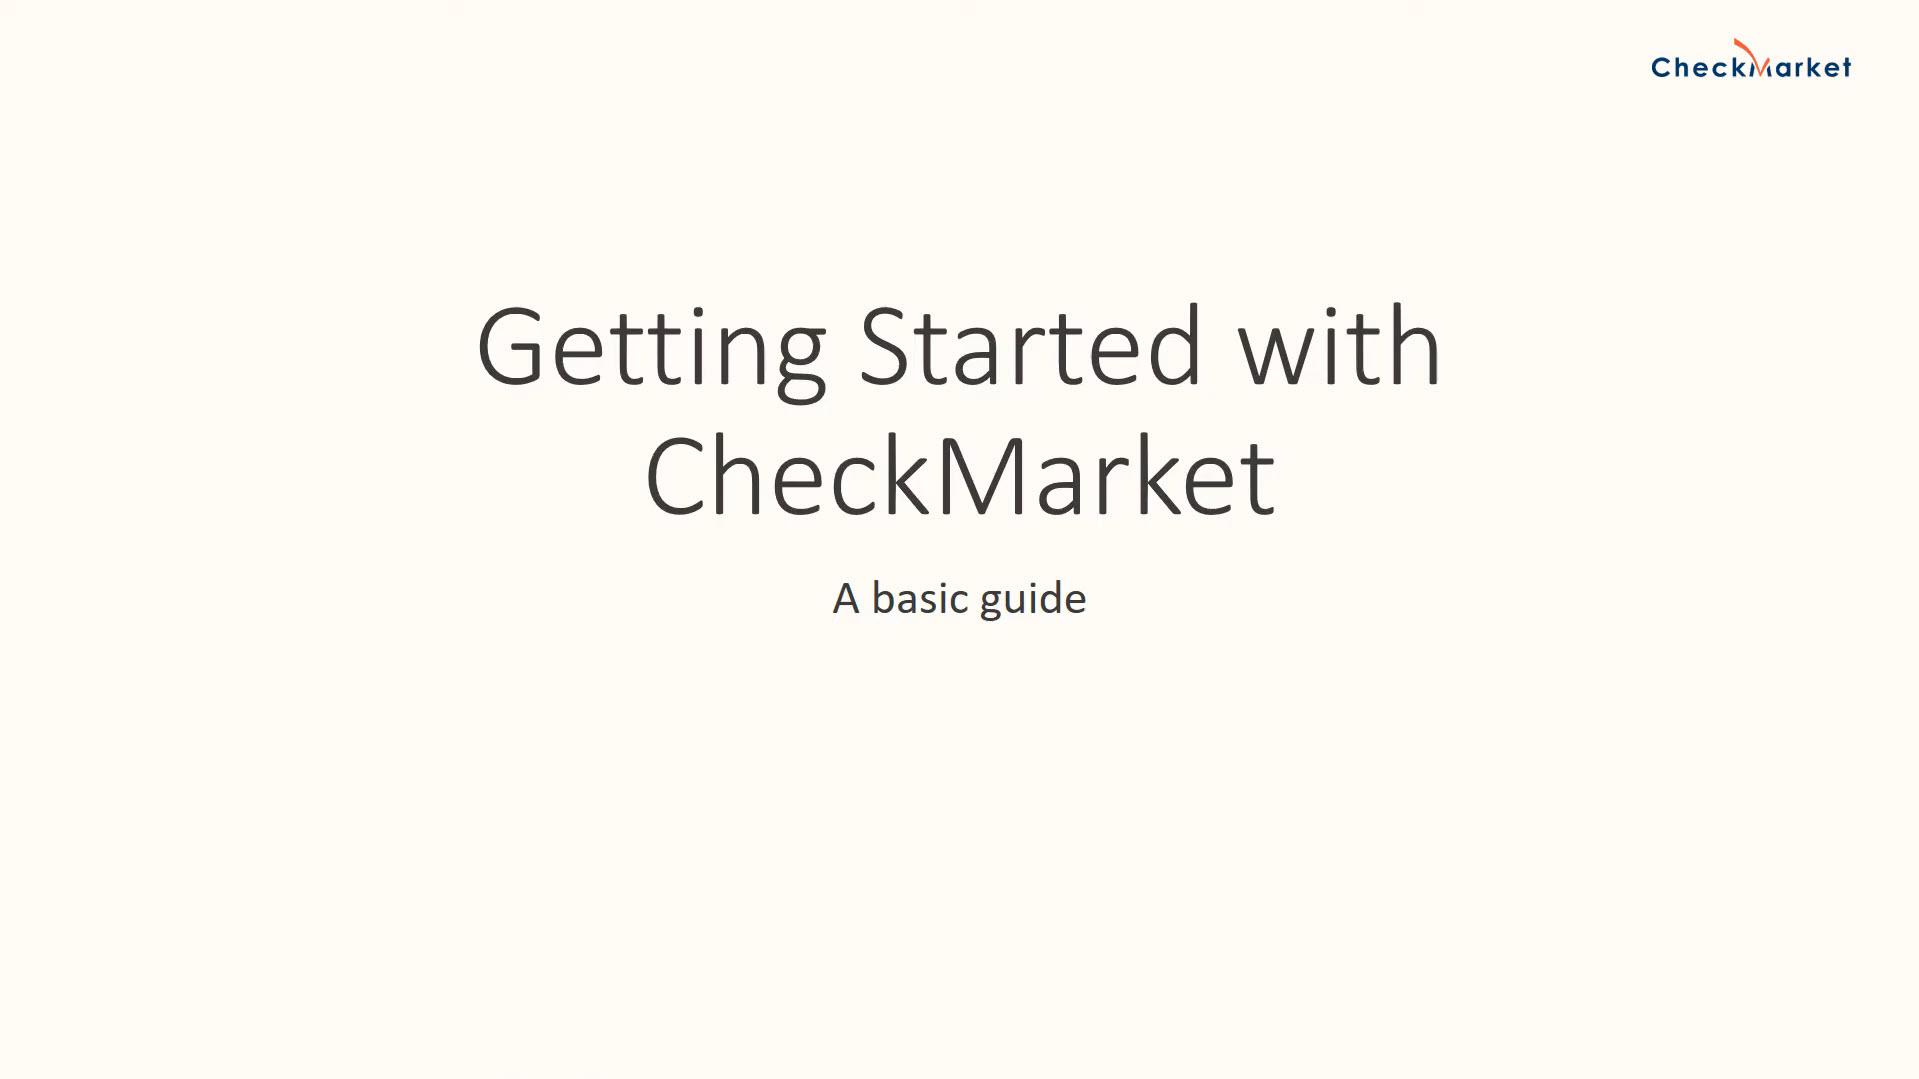 CheckMarket